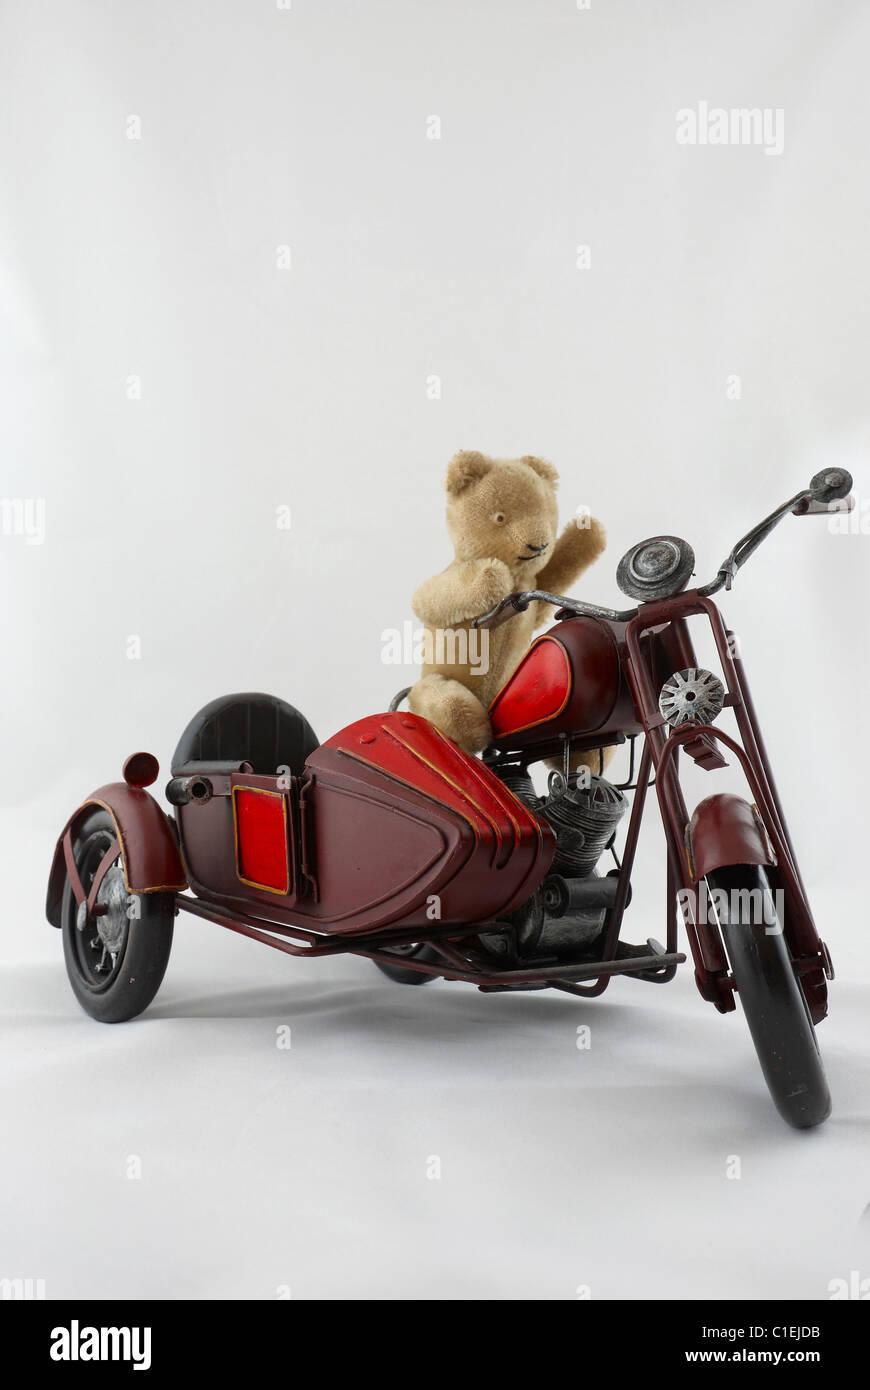 Toy Motorbike Stock Photos & Toy Motorbike Stock Images - Alamy